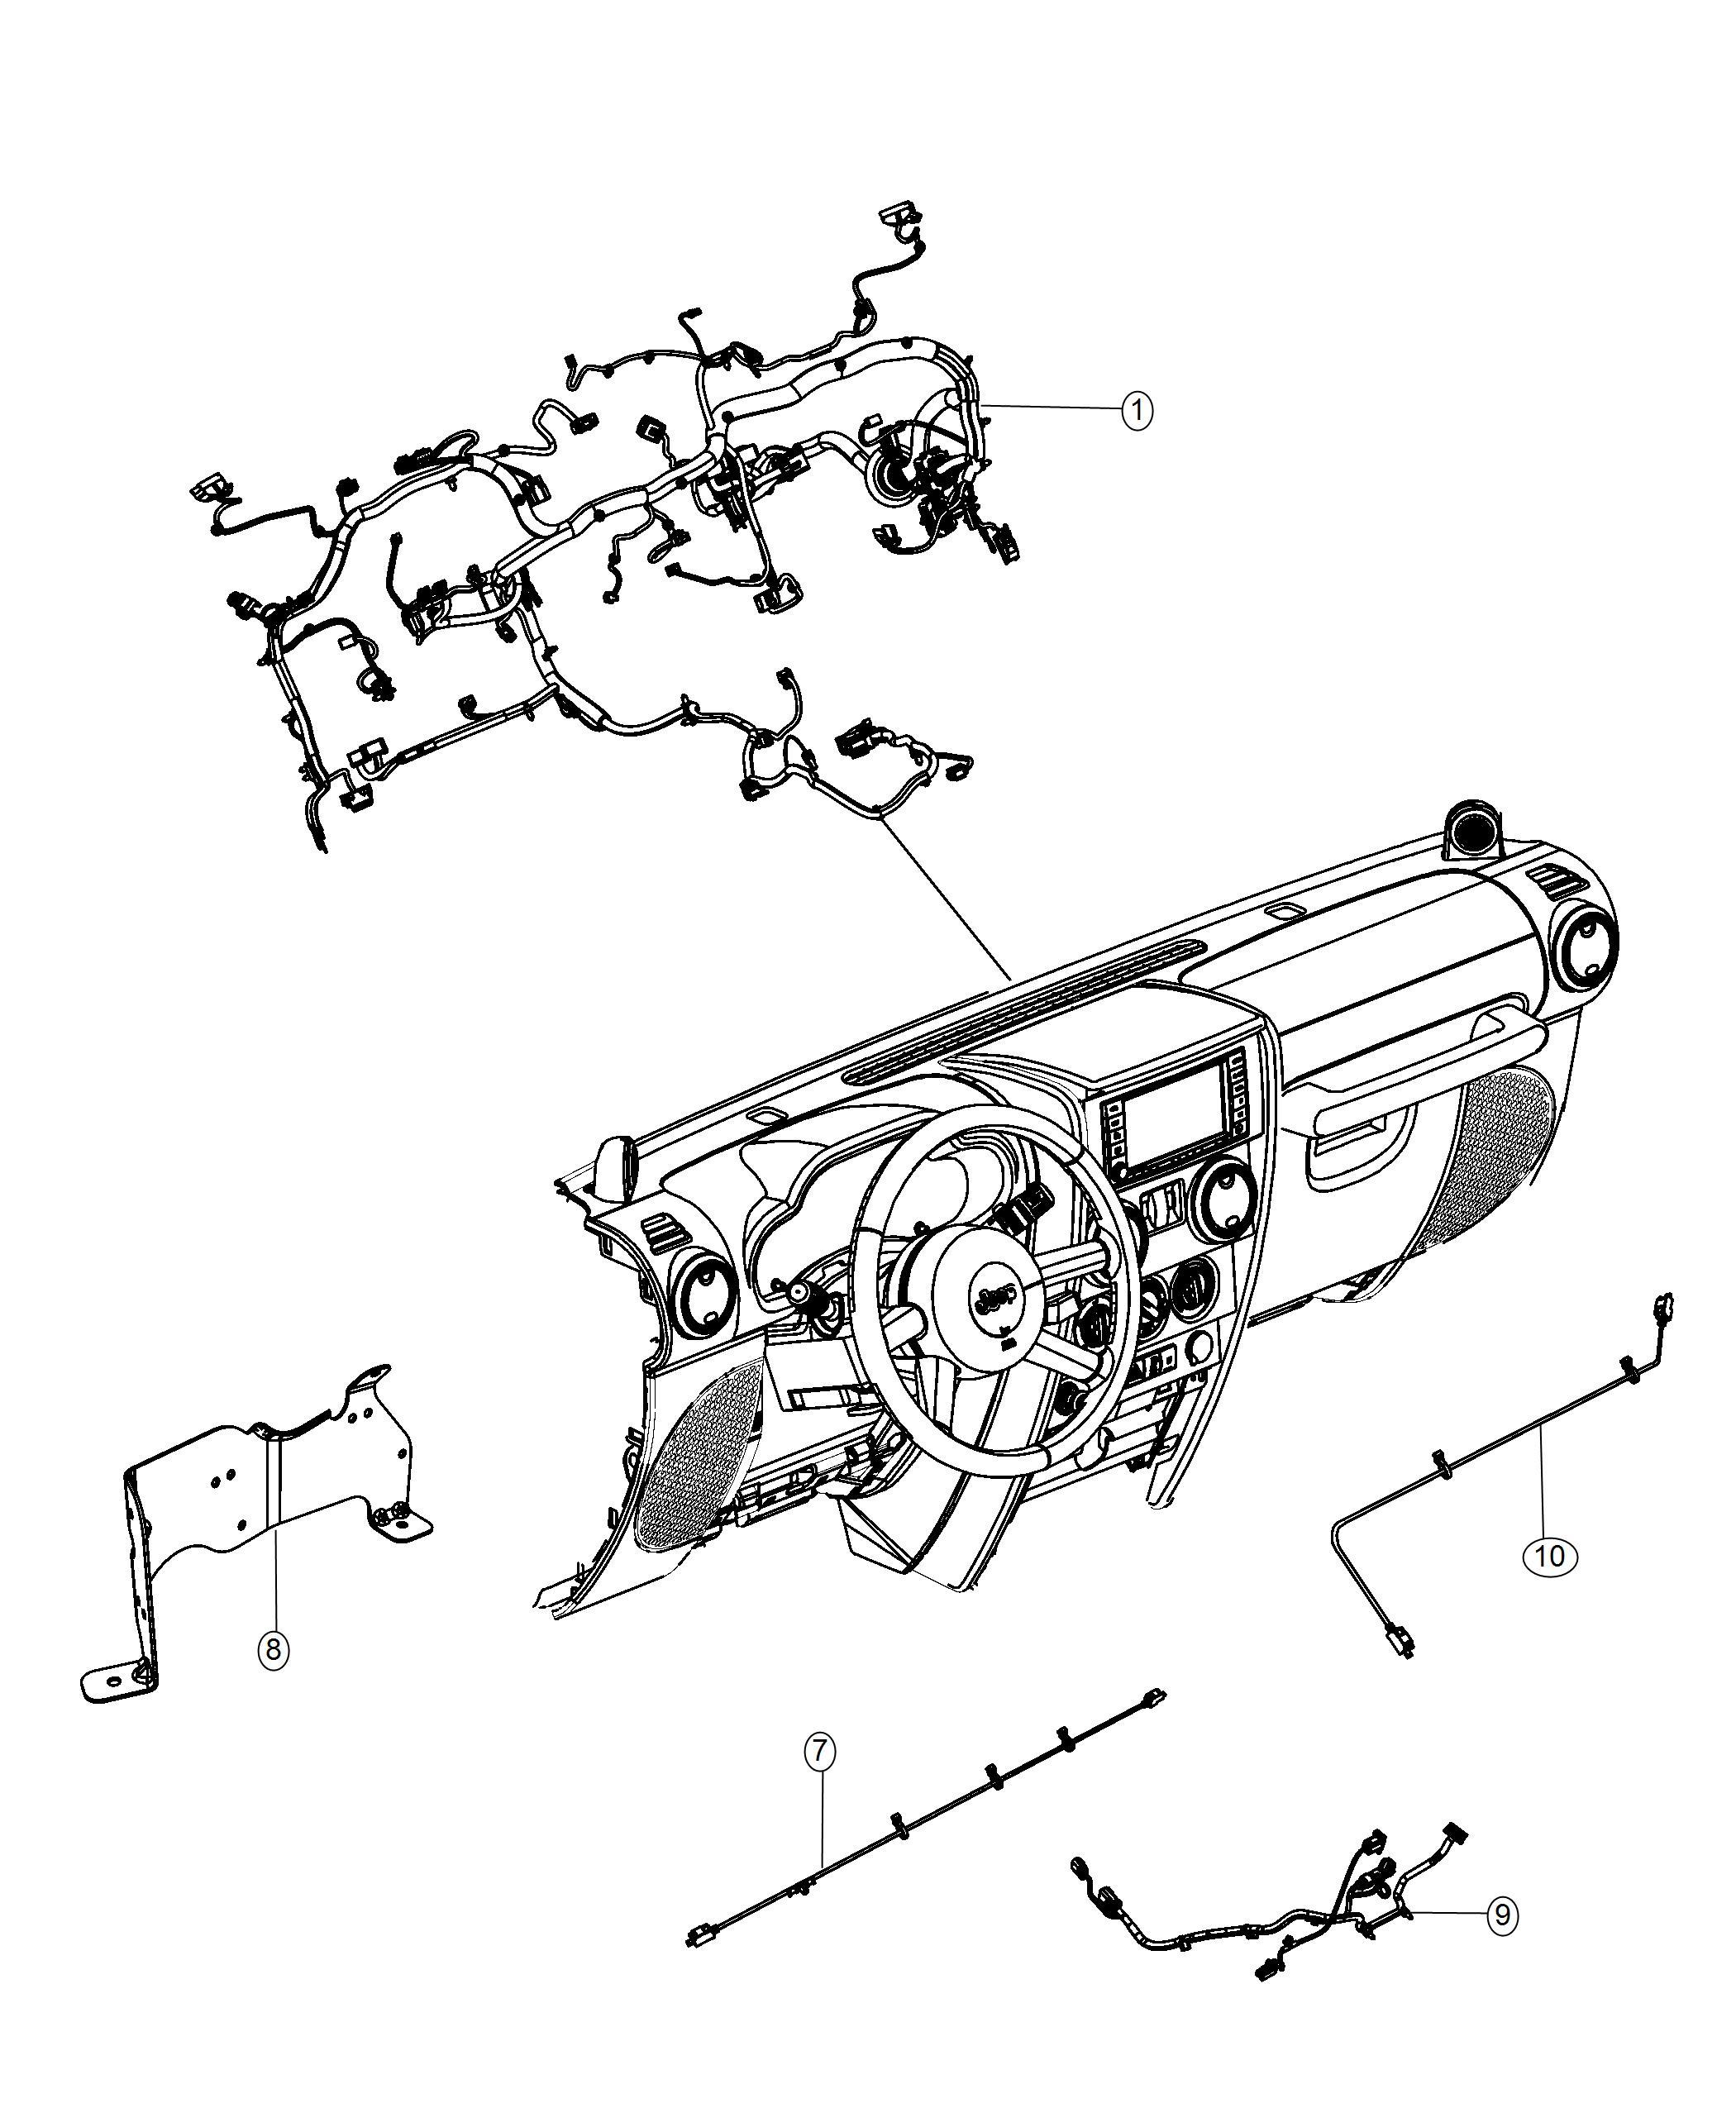 Cj7 Ignition Wiring Diagram As Well 1986 Jeep Cj7 Wiring Diagram On